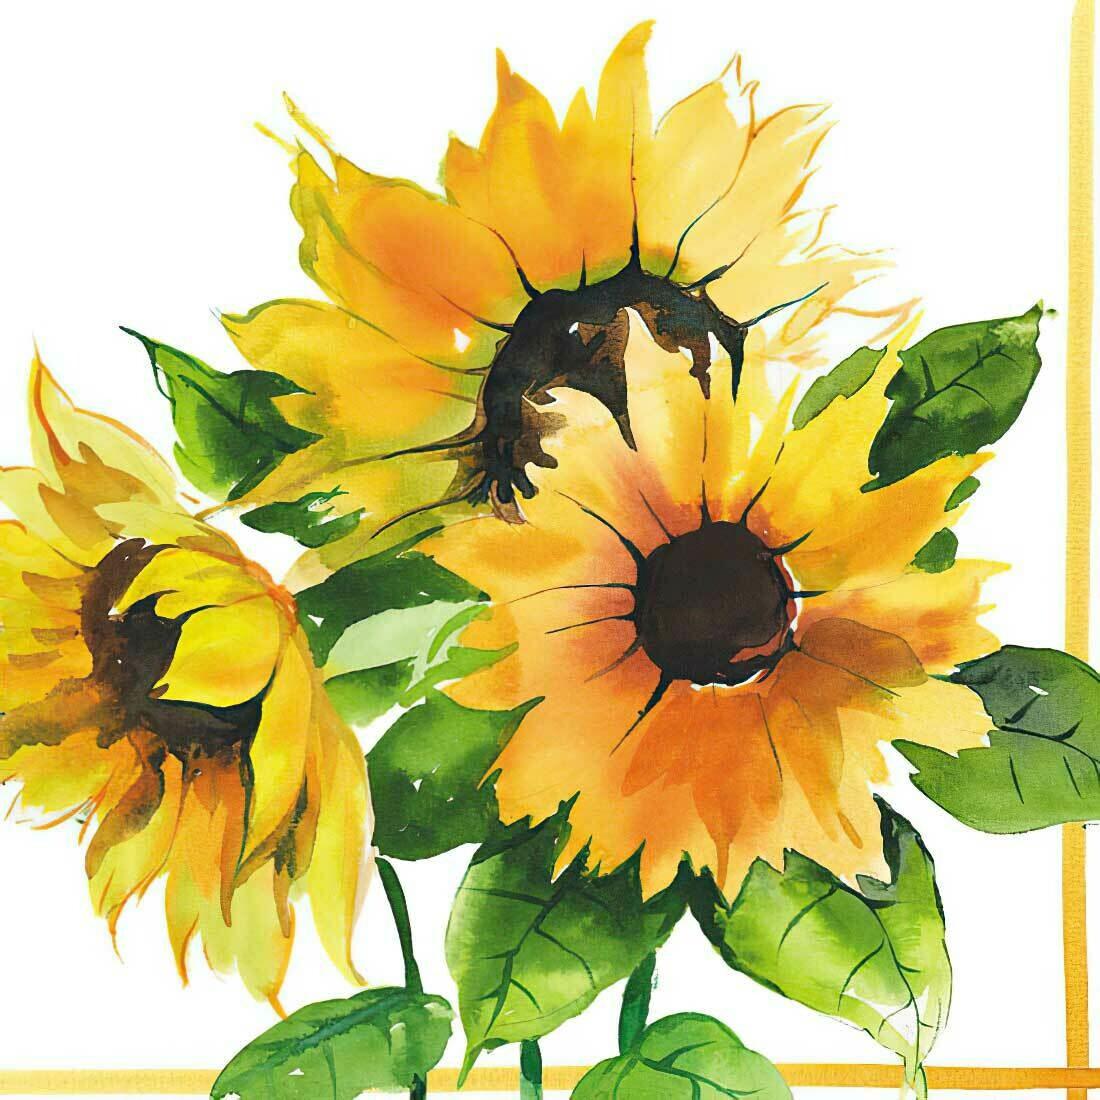 Decoupage Paper Napkins - Floral - Girasoli (Sunflower) 13x13 (1 Sheet)